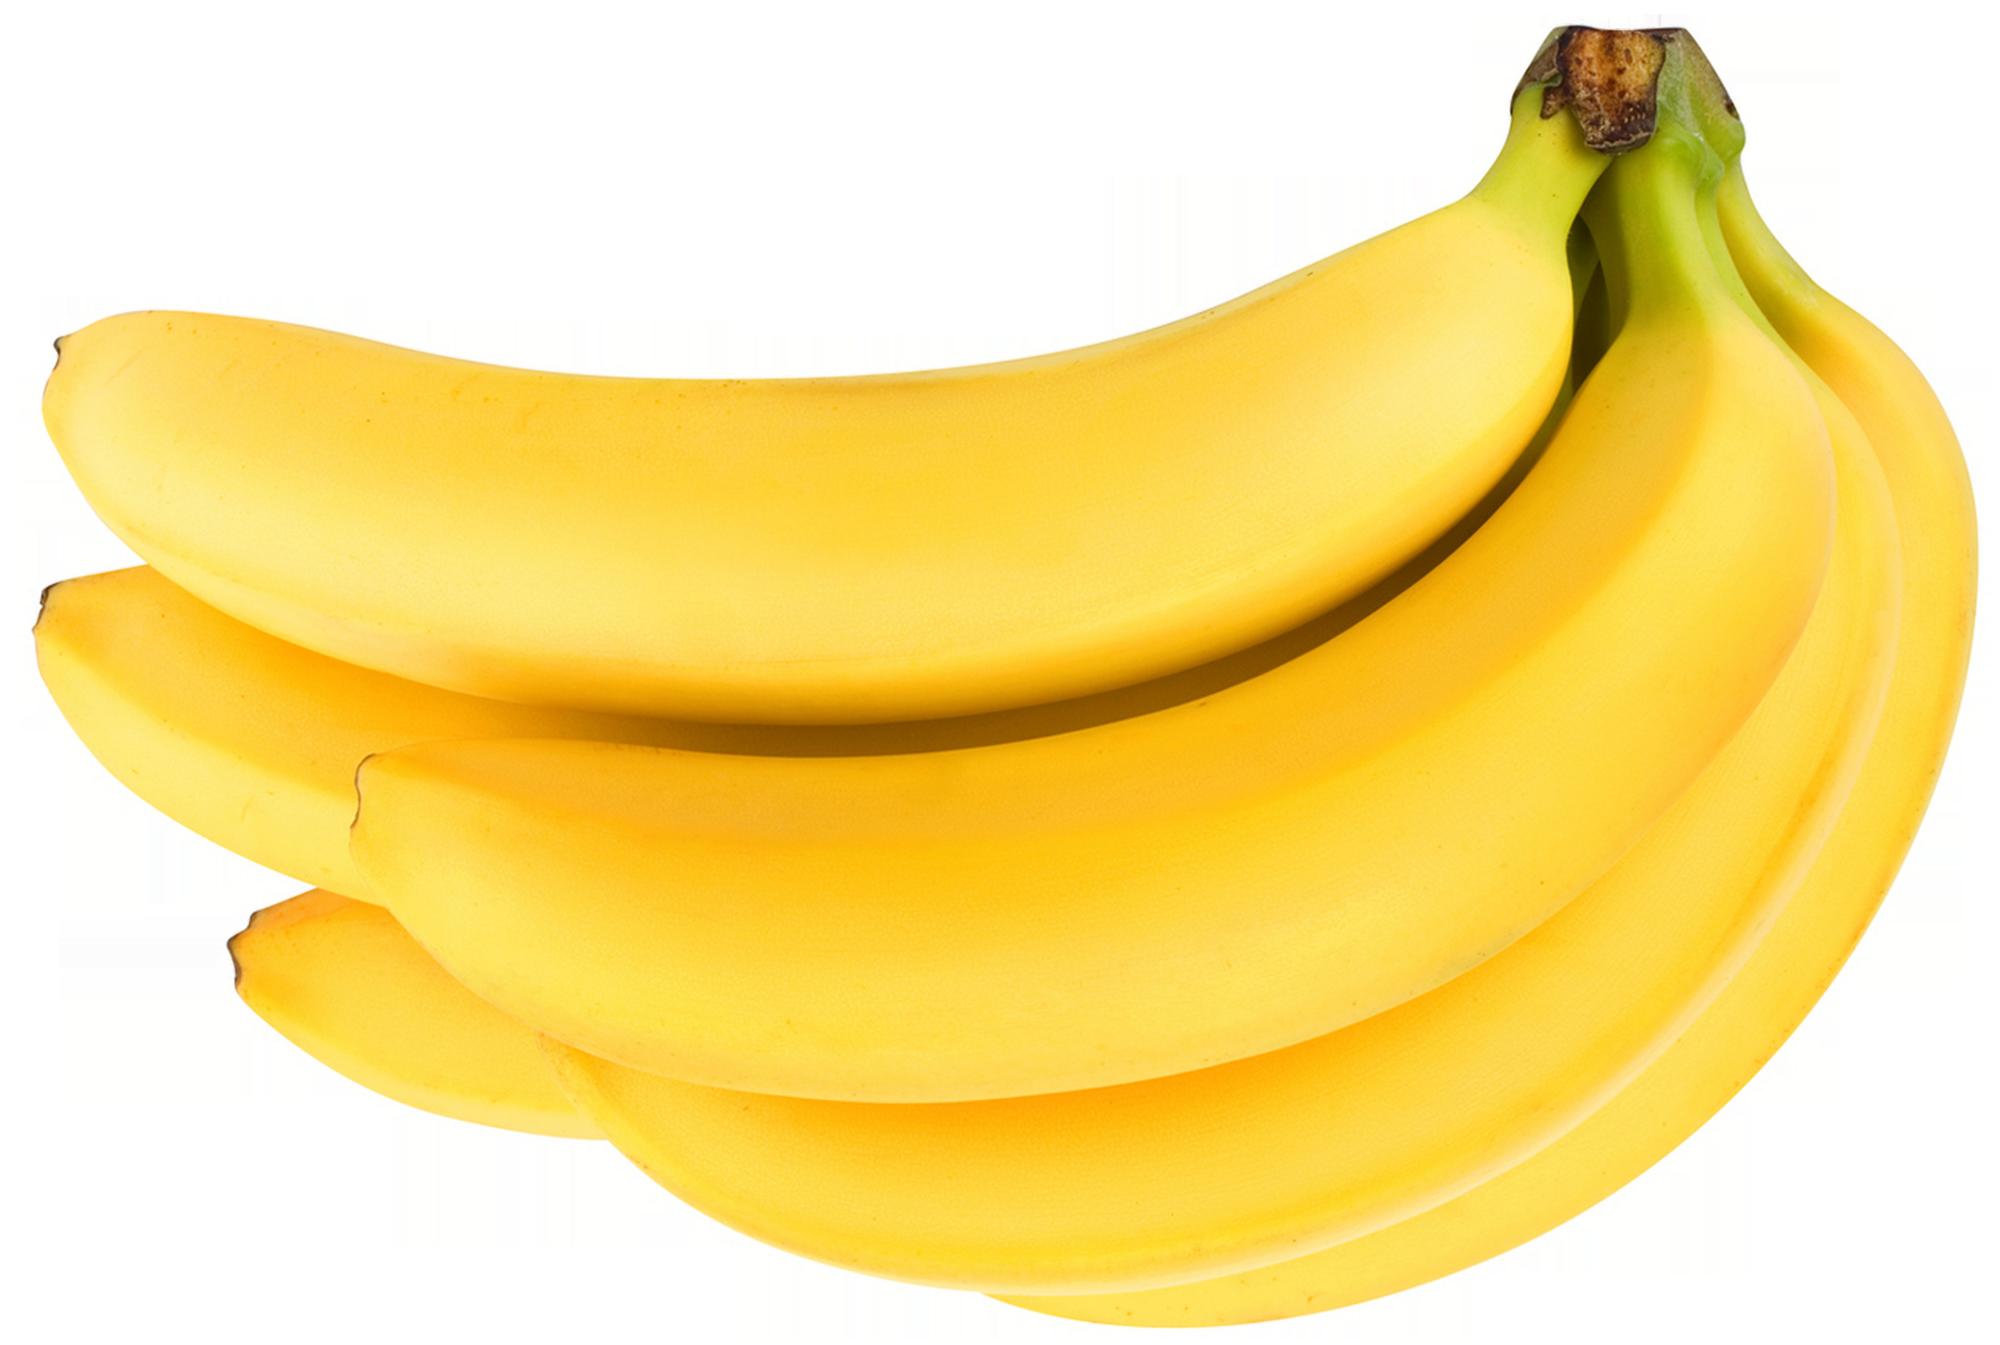 Large Bananas PNG Clipart.